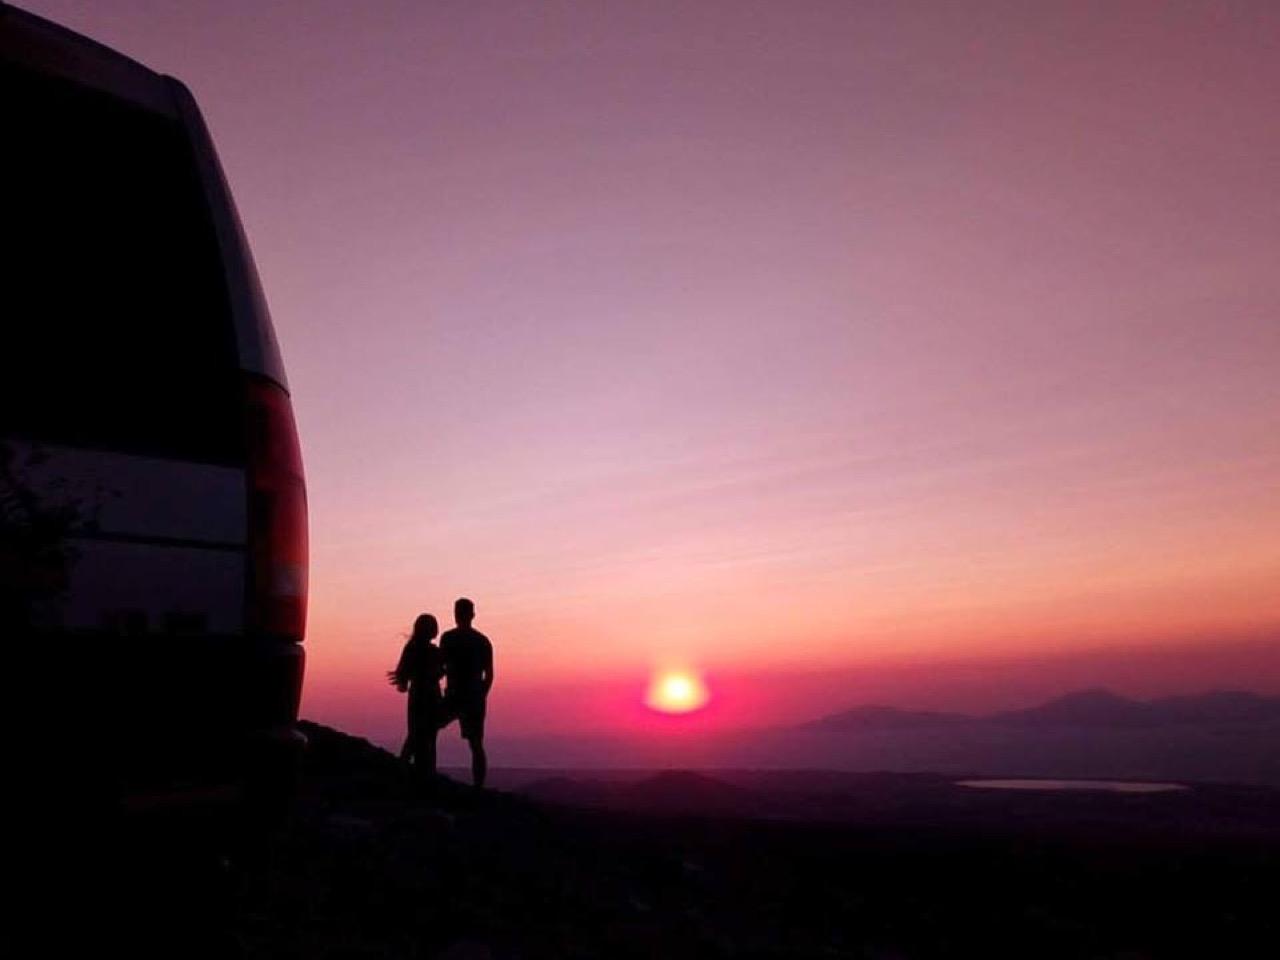 Chania Premium Sunset Safari Tour, best jeep safari sunset tour chania crete, chania crete jeep safaris, chania sunset private tour, best activities chania crete, what to do in Chania Crete, chania mainland discover, jeep safaris chania crete